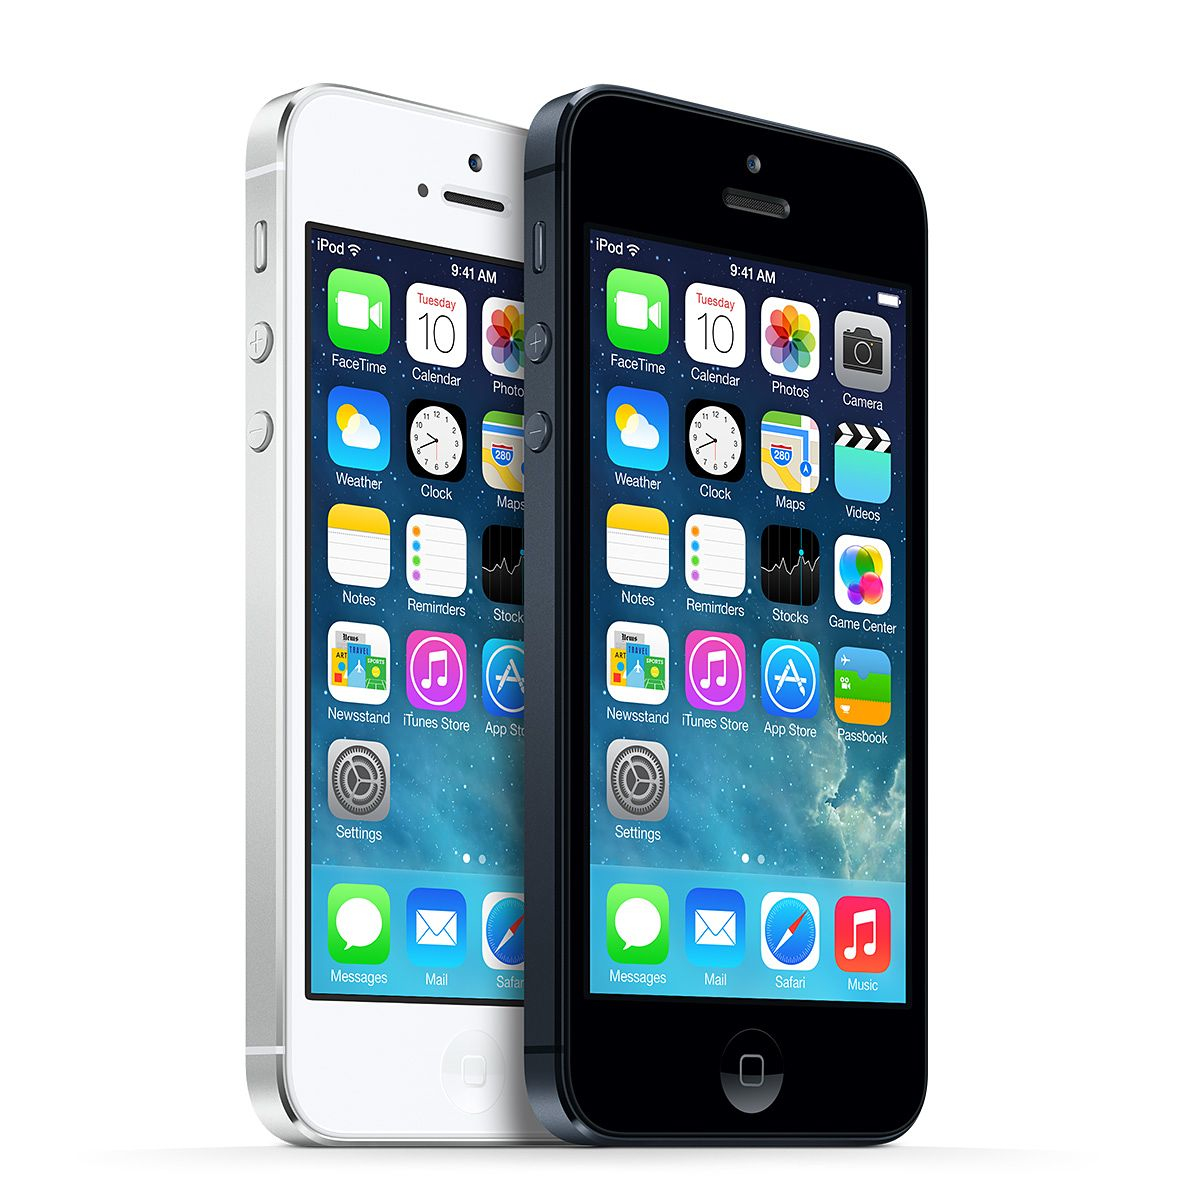 iPhones 5 em pé